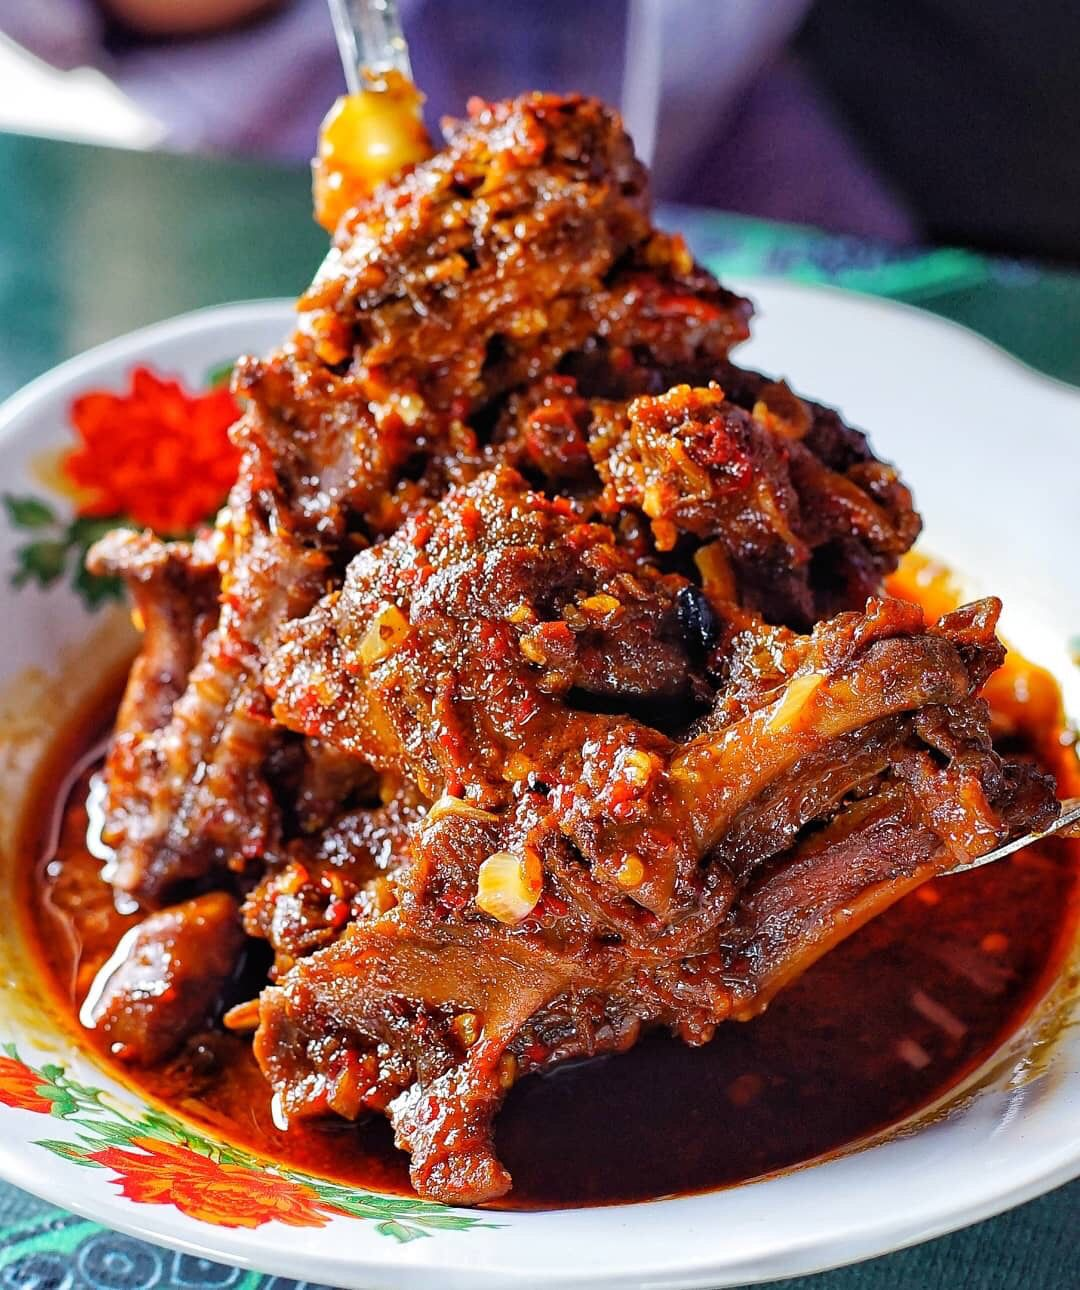 Rekomendasi Wisata Kuliner Makanan Khas Yogyakarta Sowak Sop